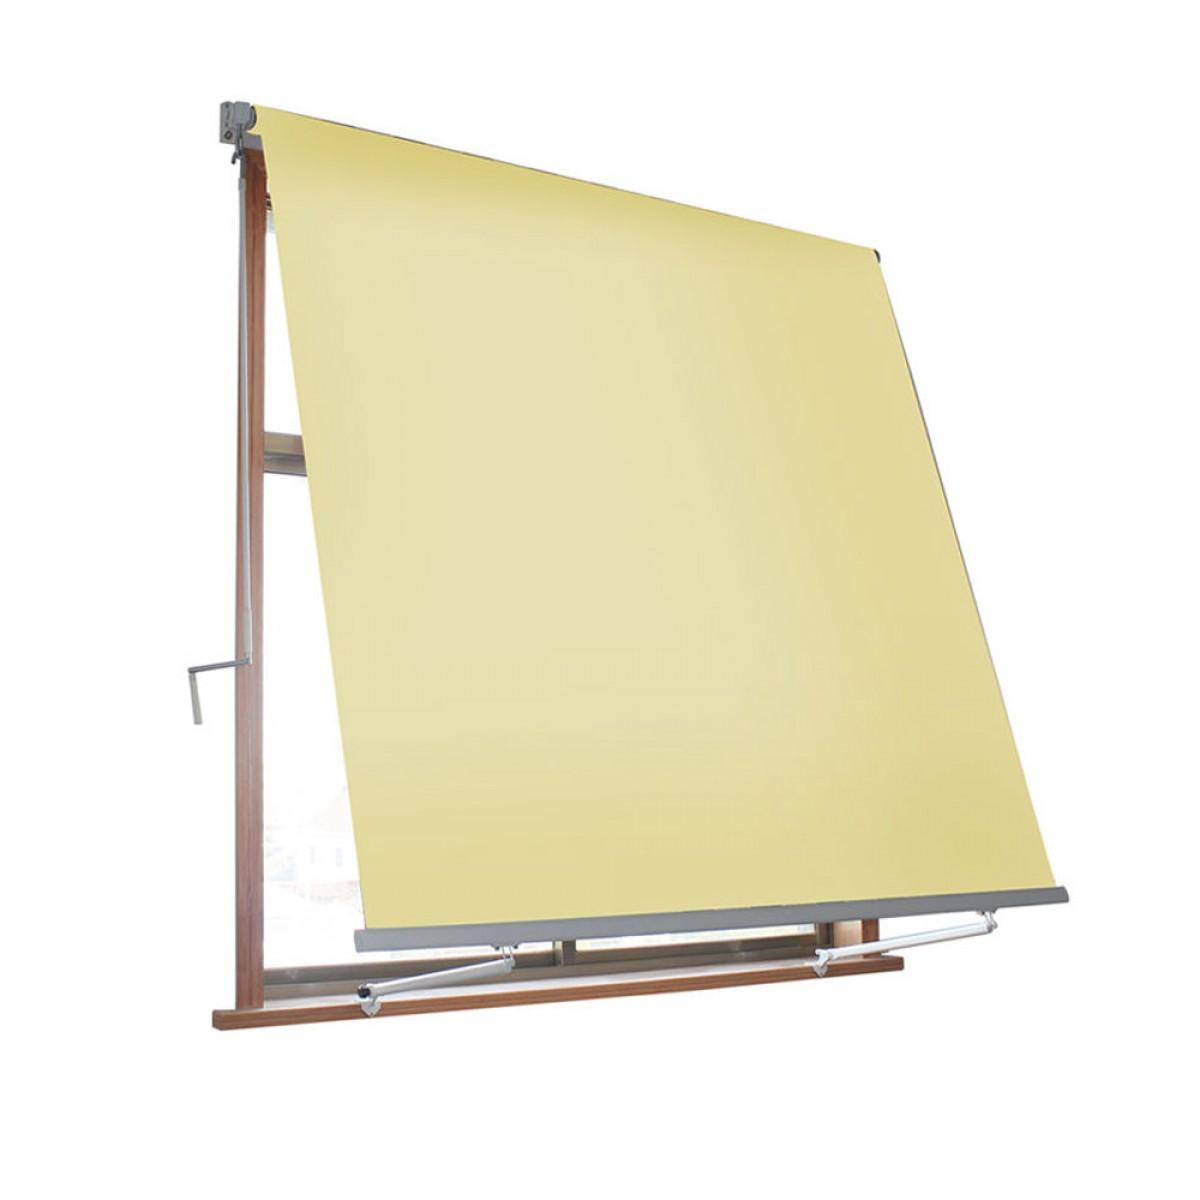 VERDELOOK Tenda da Sole avvolgibile a caduta con braccetti mt 3 x 2,45